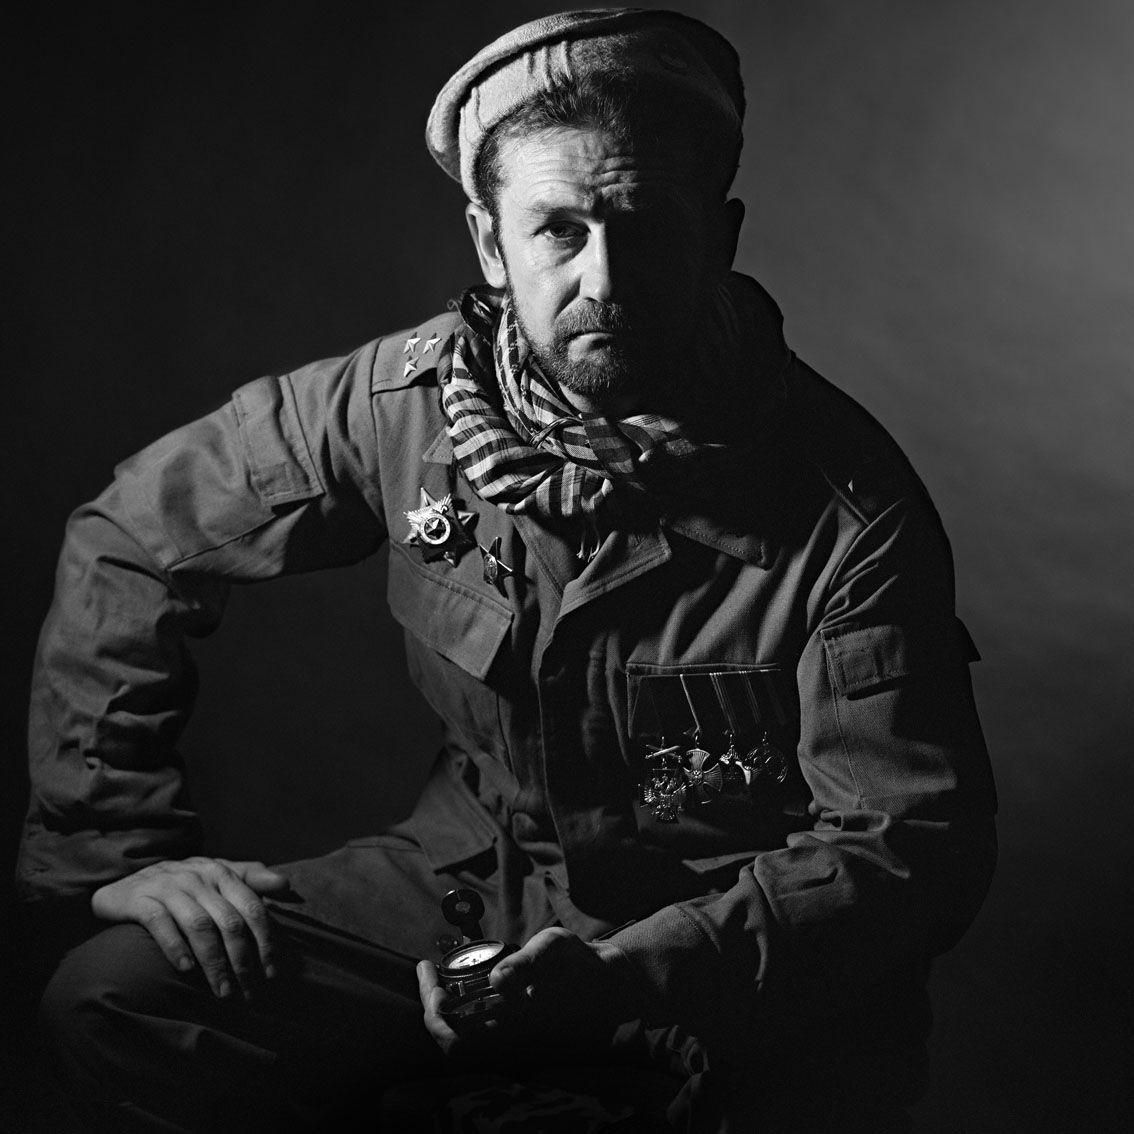 VETERANS OF SPETSNAZ: PORTRAITS OF SECRET SOLDIERS - 1